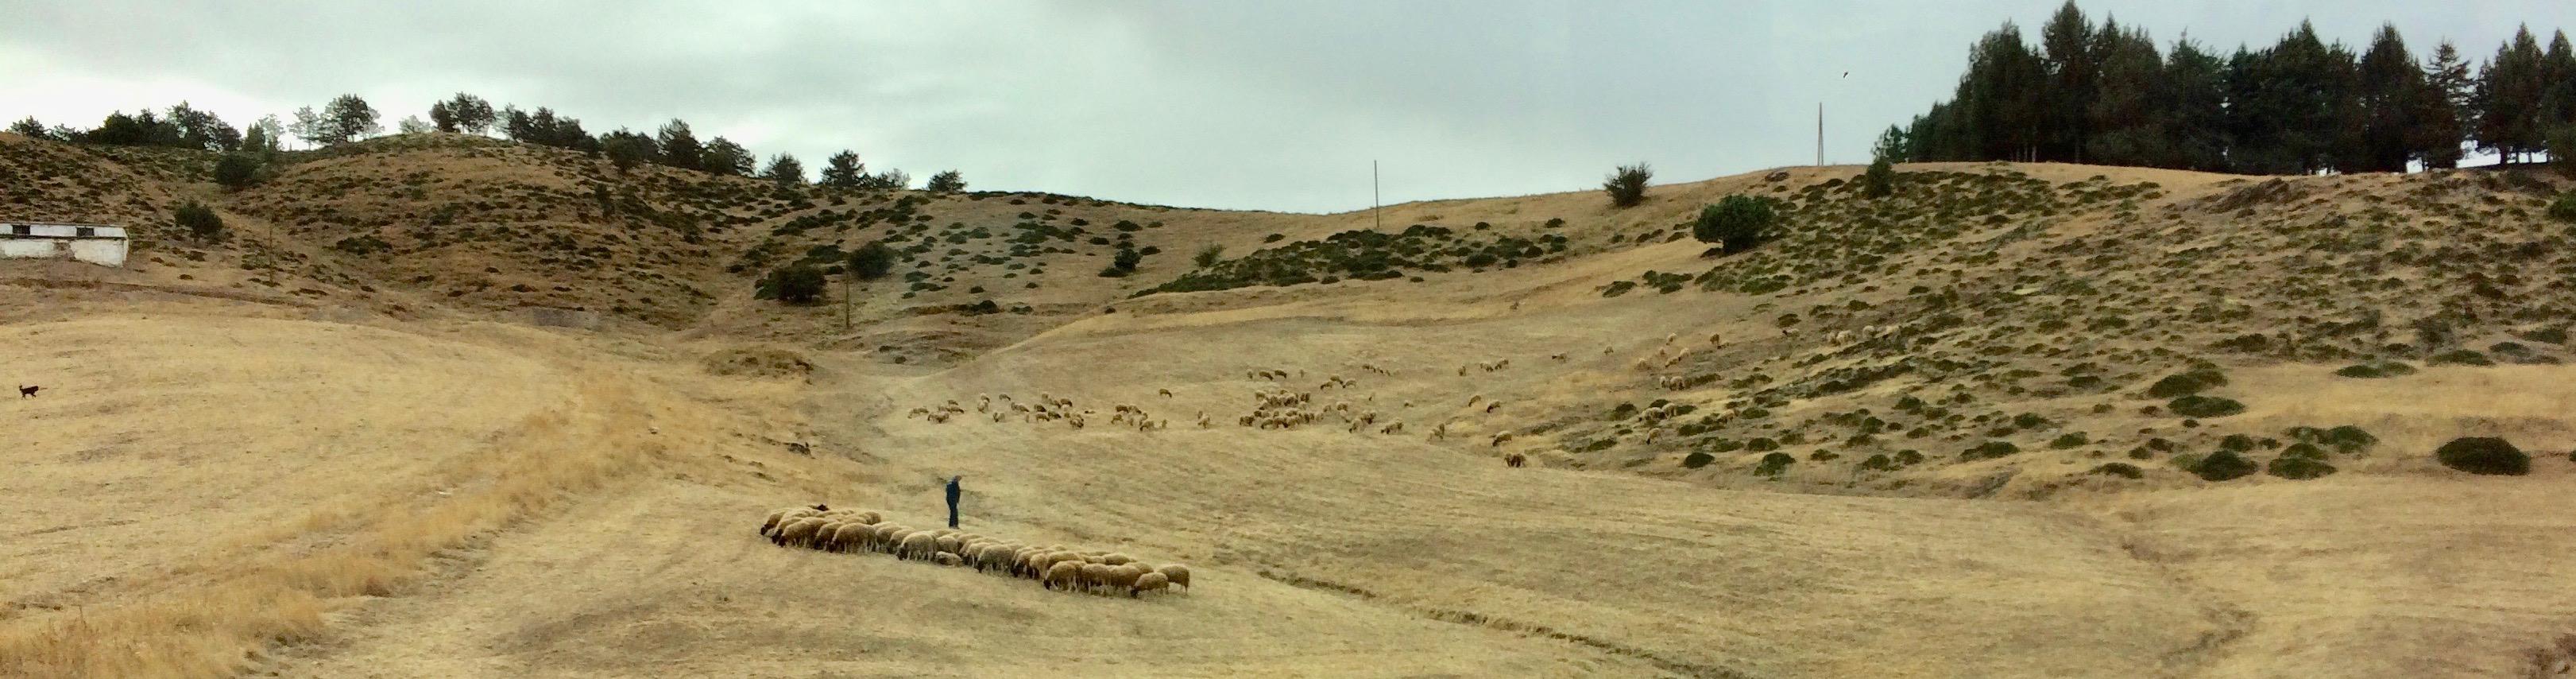 Shepherd and flock near Meknes